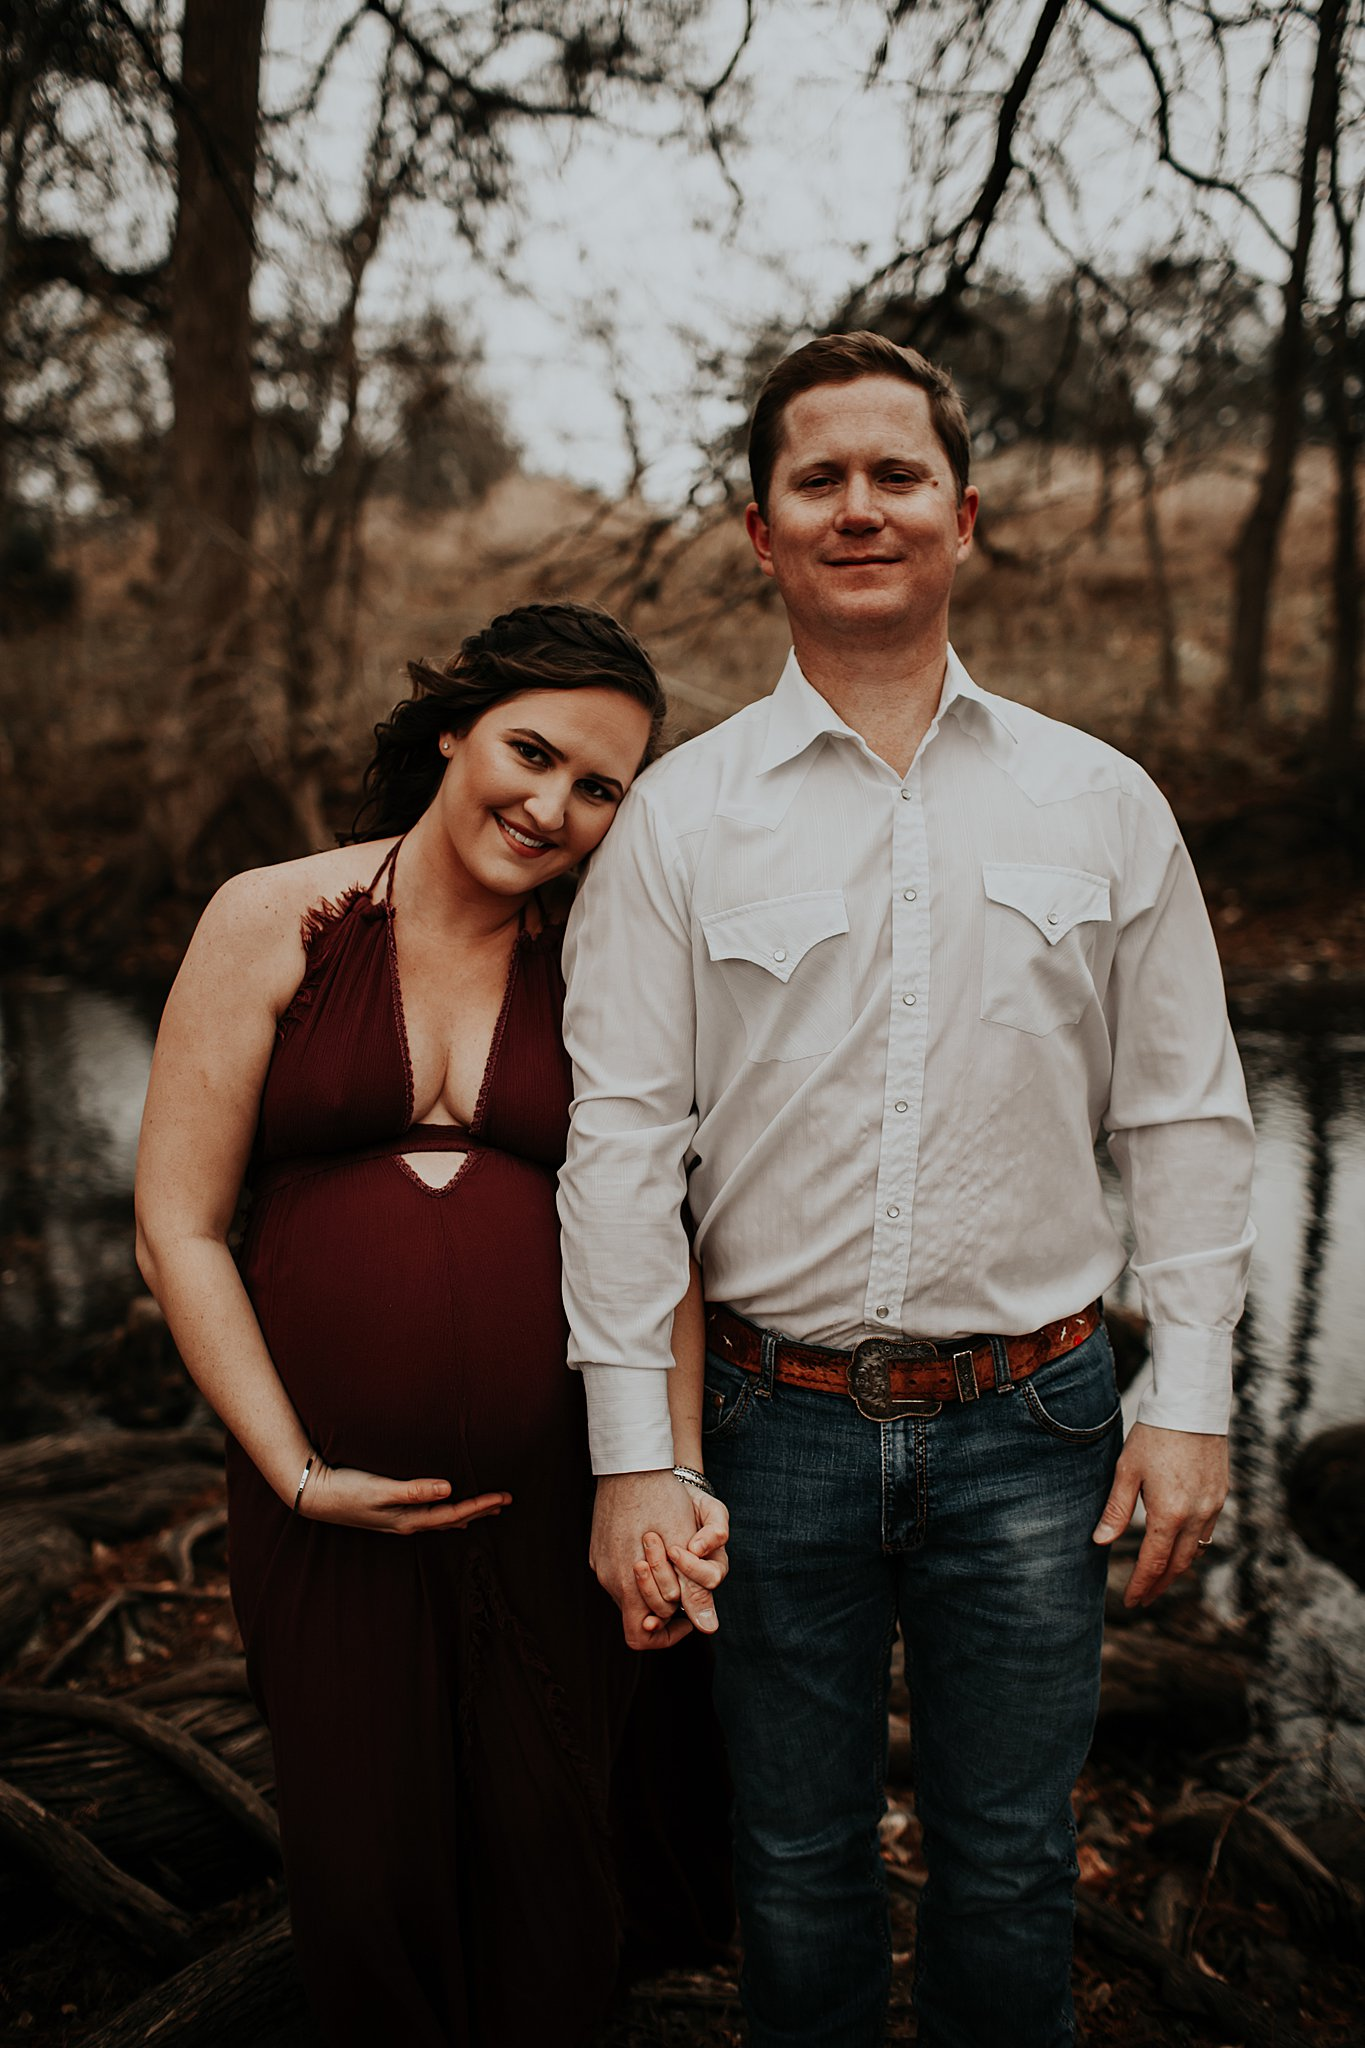 Katie-San-Antonio-Maternity-Photographer-9_WEB.jpg